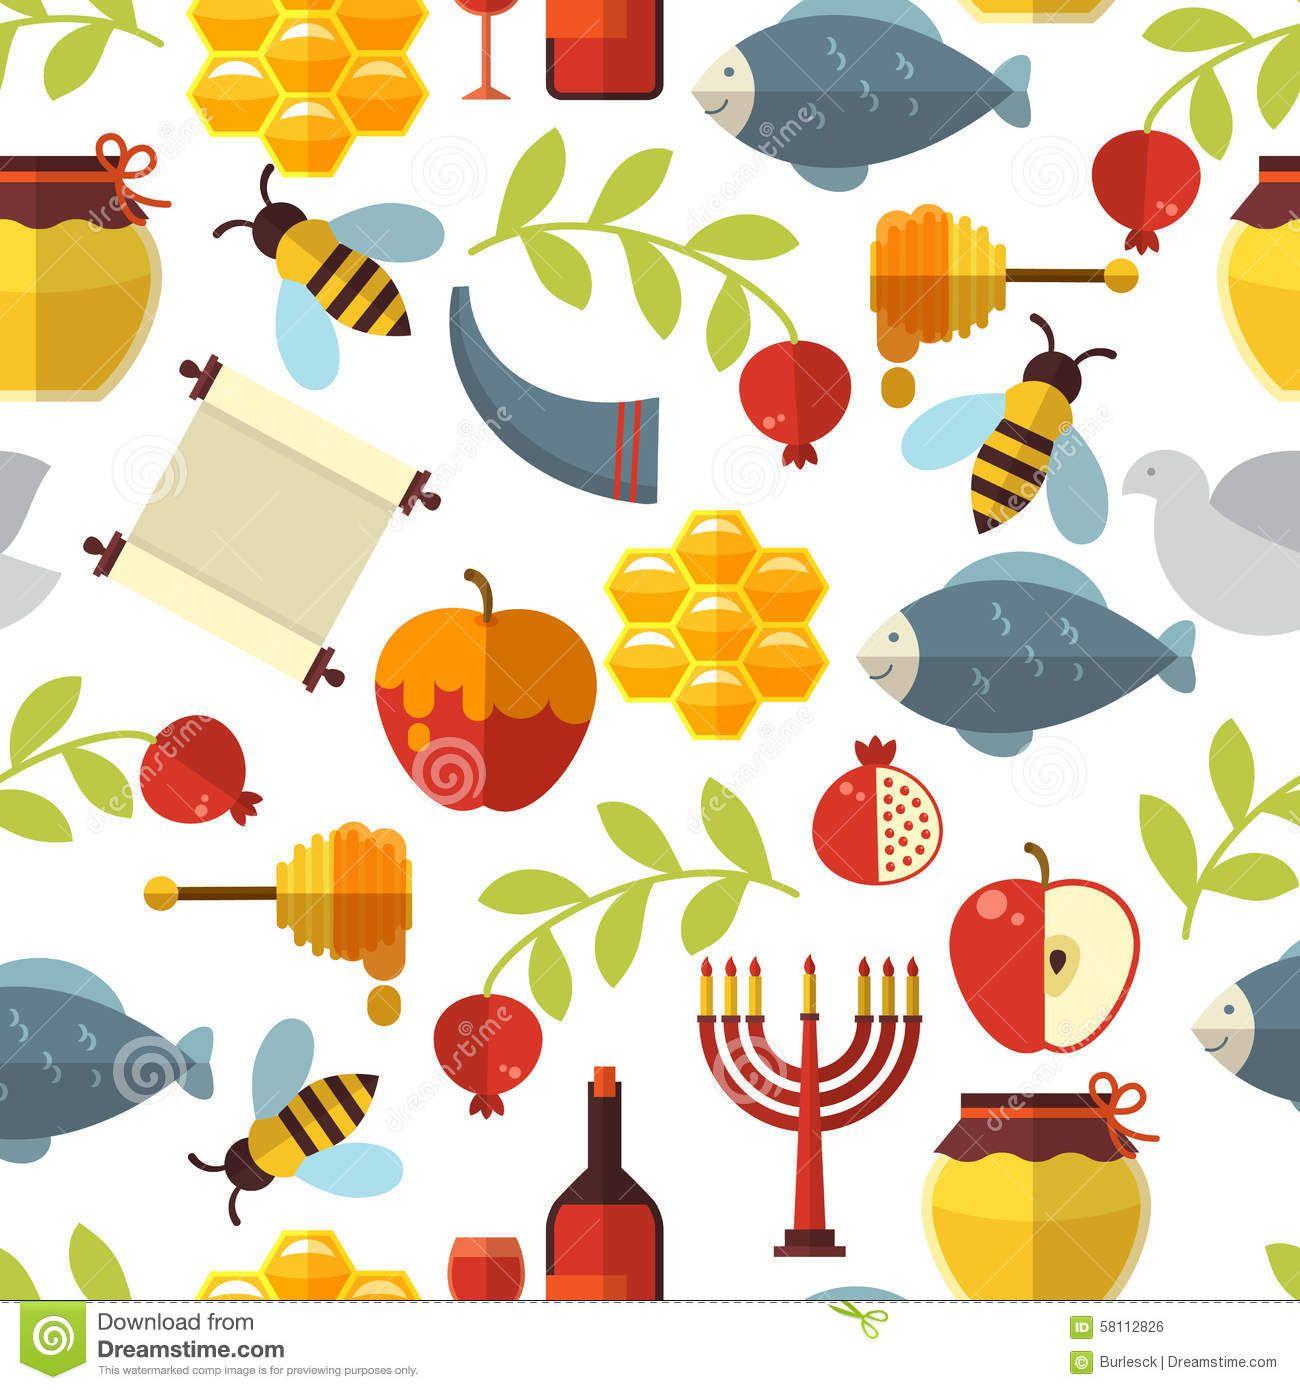 Rosh Hashanah Watercolor Hebrew Shana Tovah Wishes